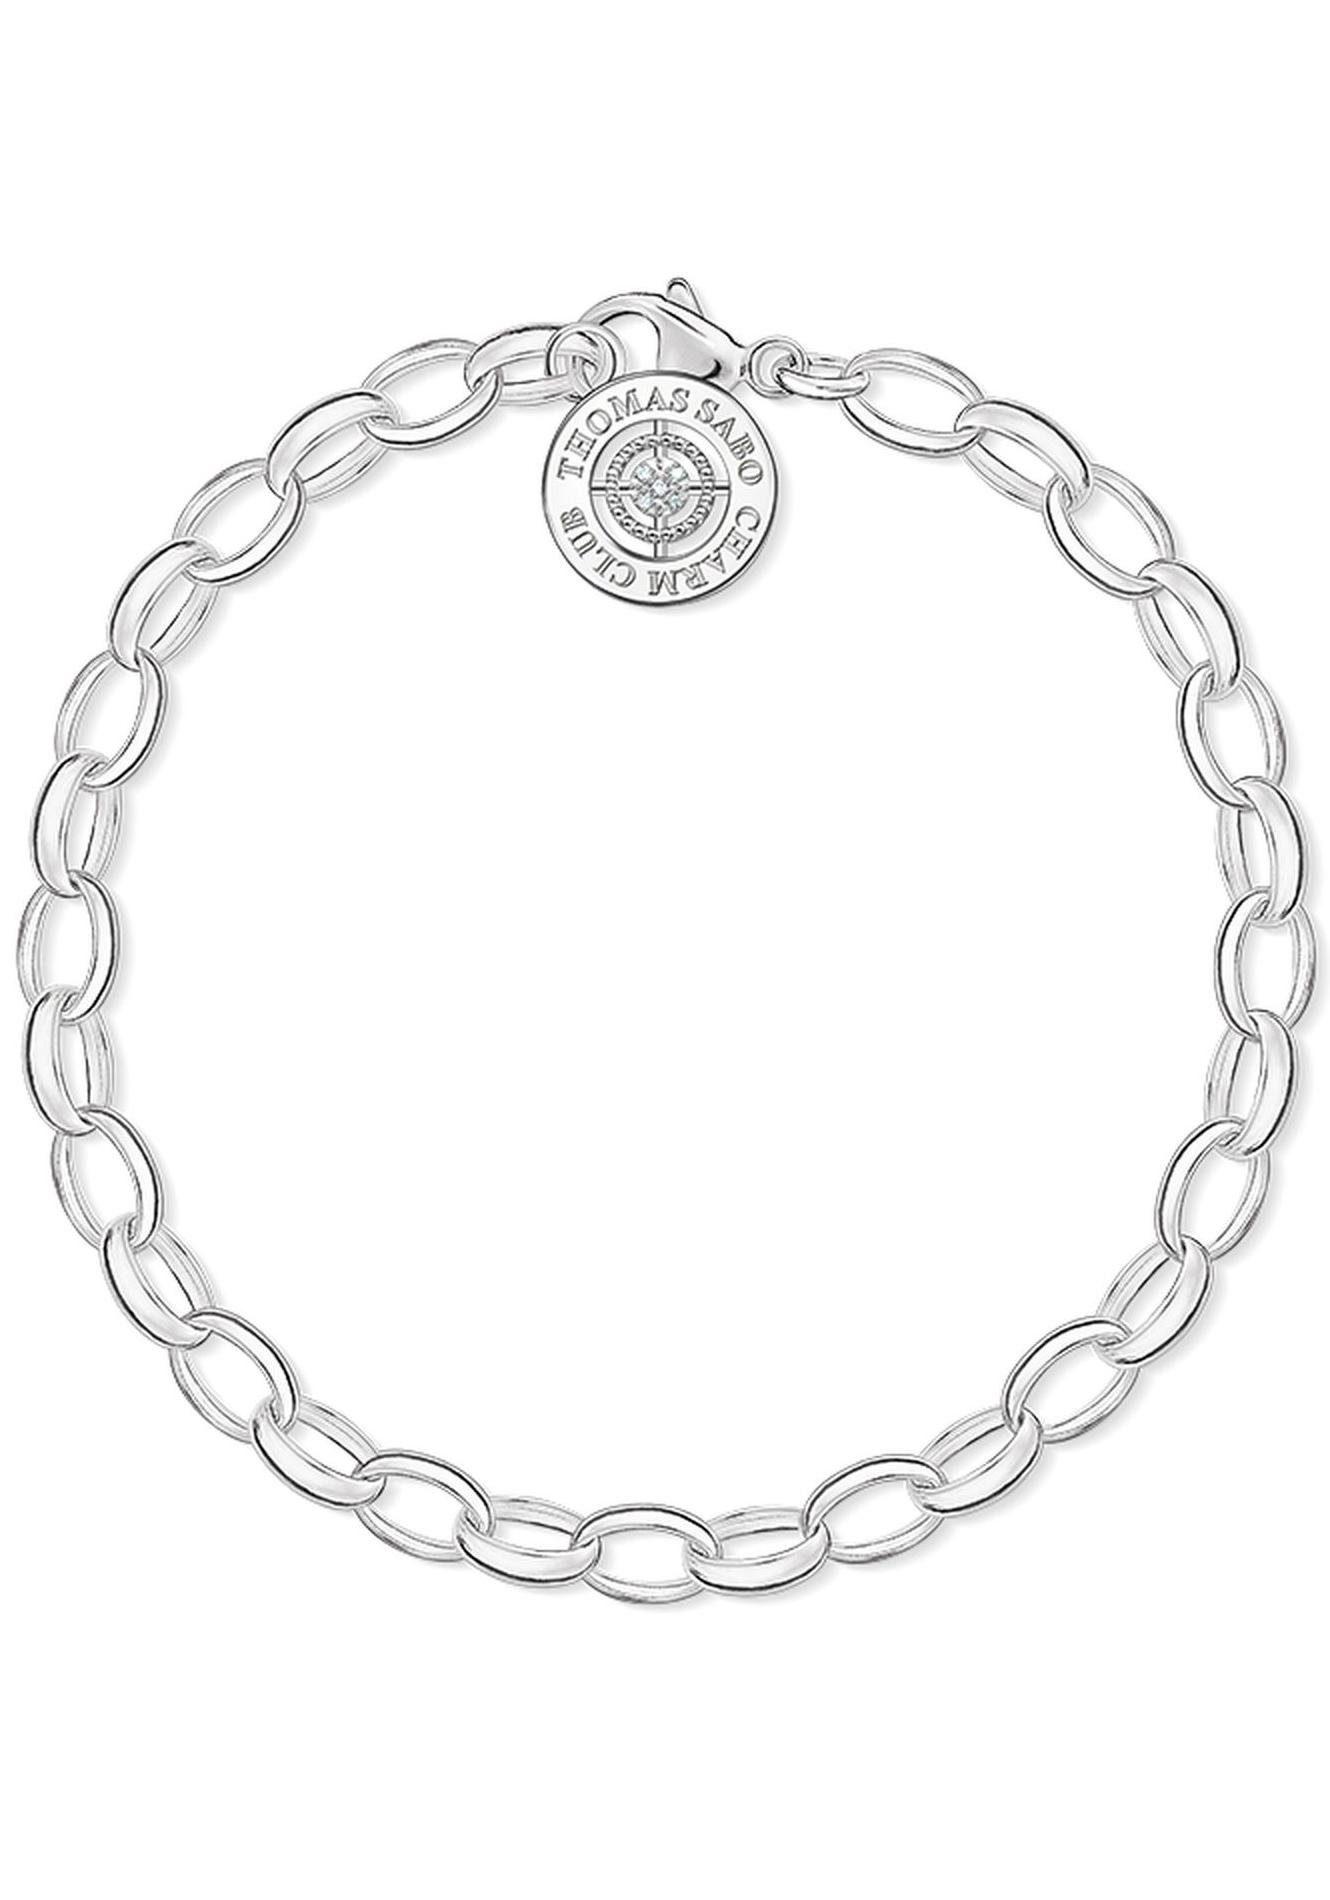 THOMAS SABO Charm-Armband »DCX0001-725-14-L, 14-M, 14-S«